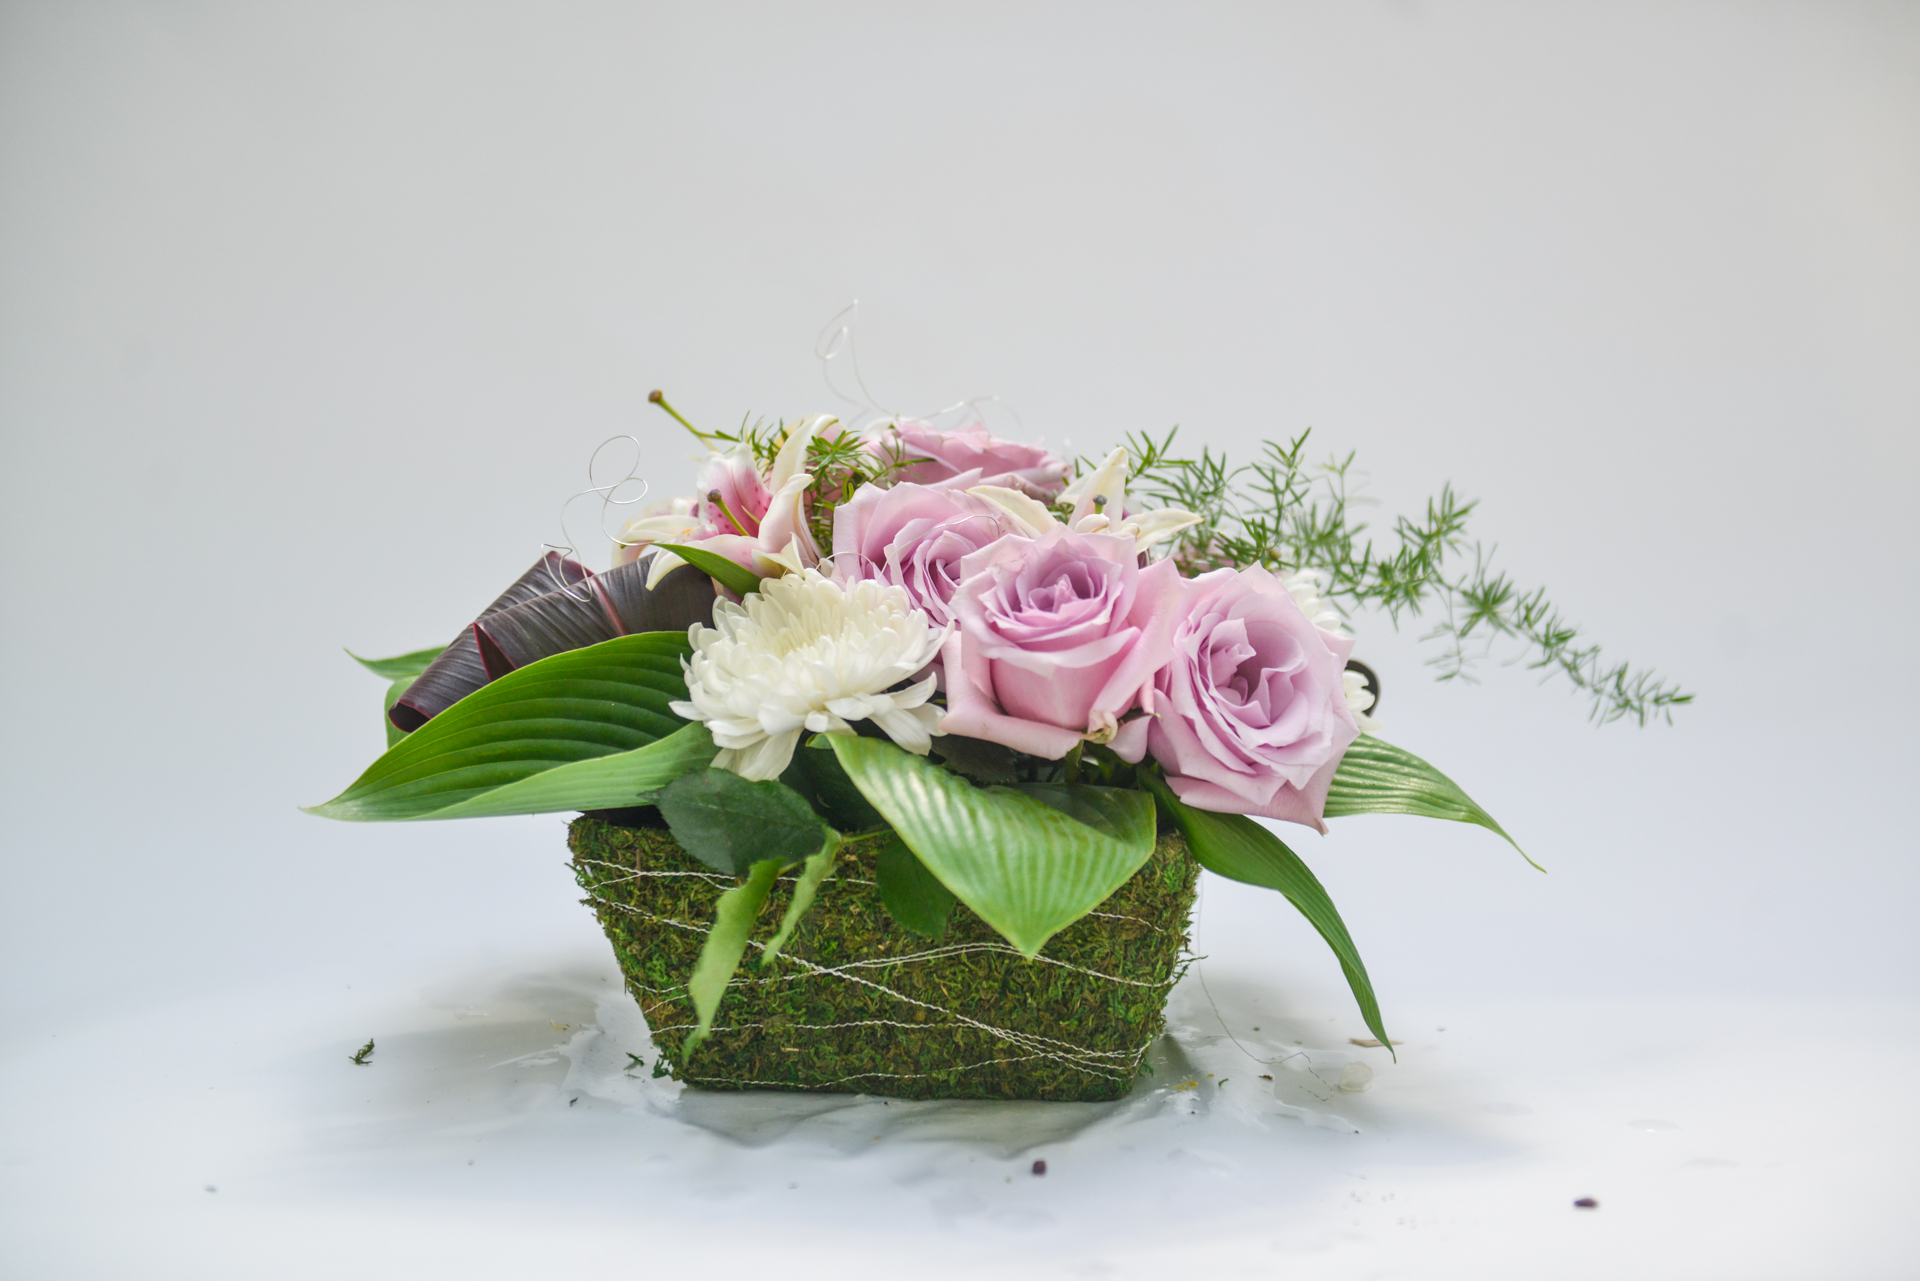 Ikenobo Ikebana by Cecilia Barnett